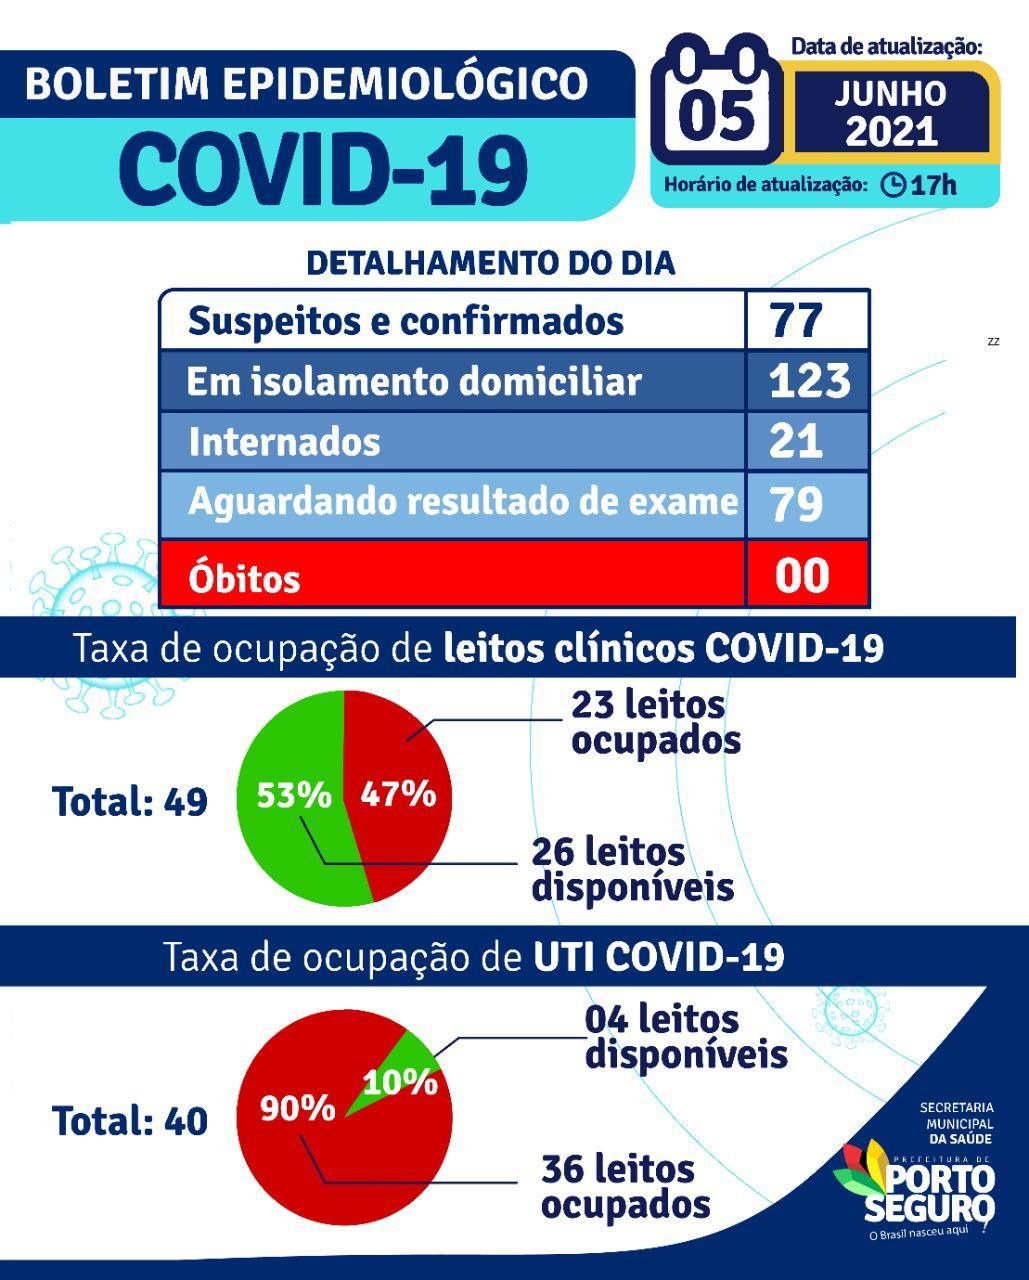 Porto Seguro: Boletim Epidemiológico Covid-19 (05/Junho) 22